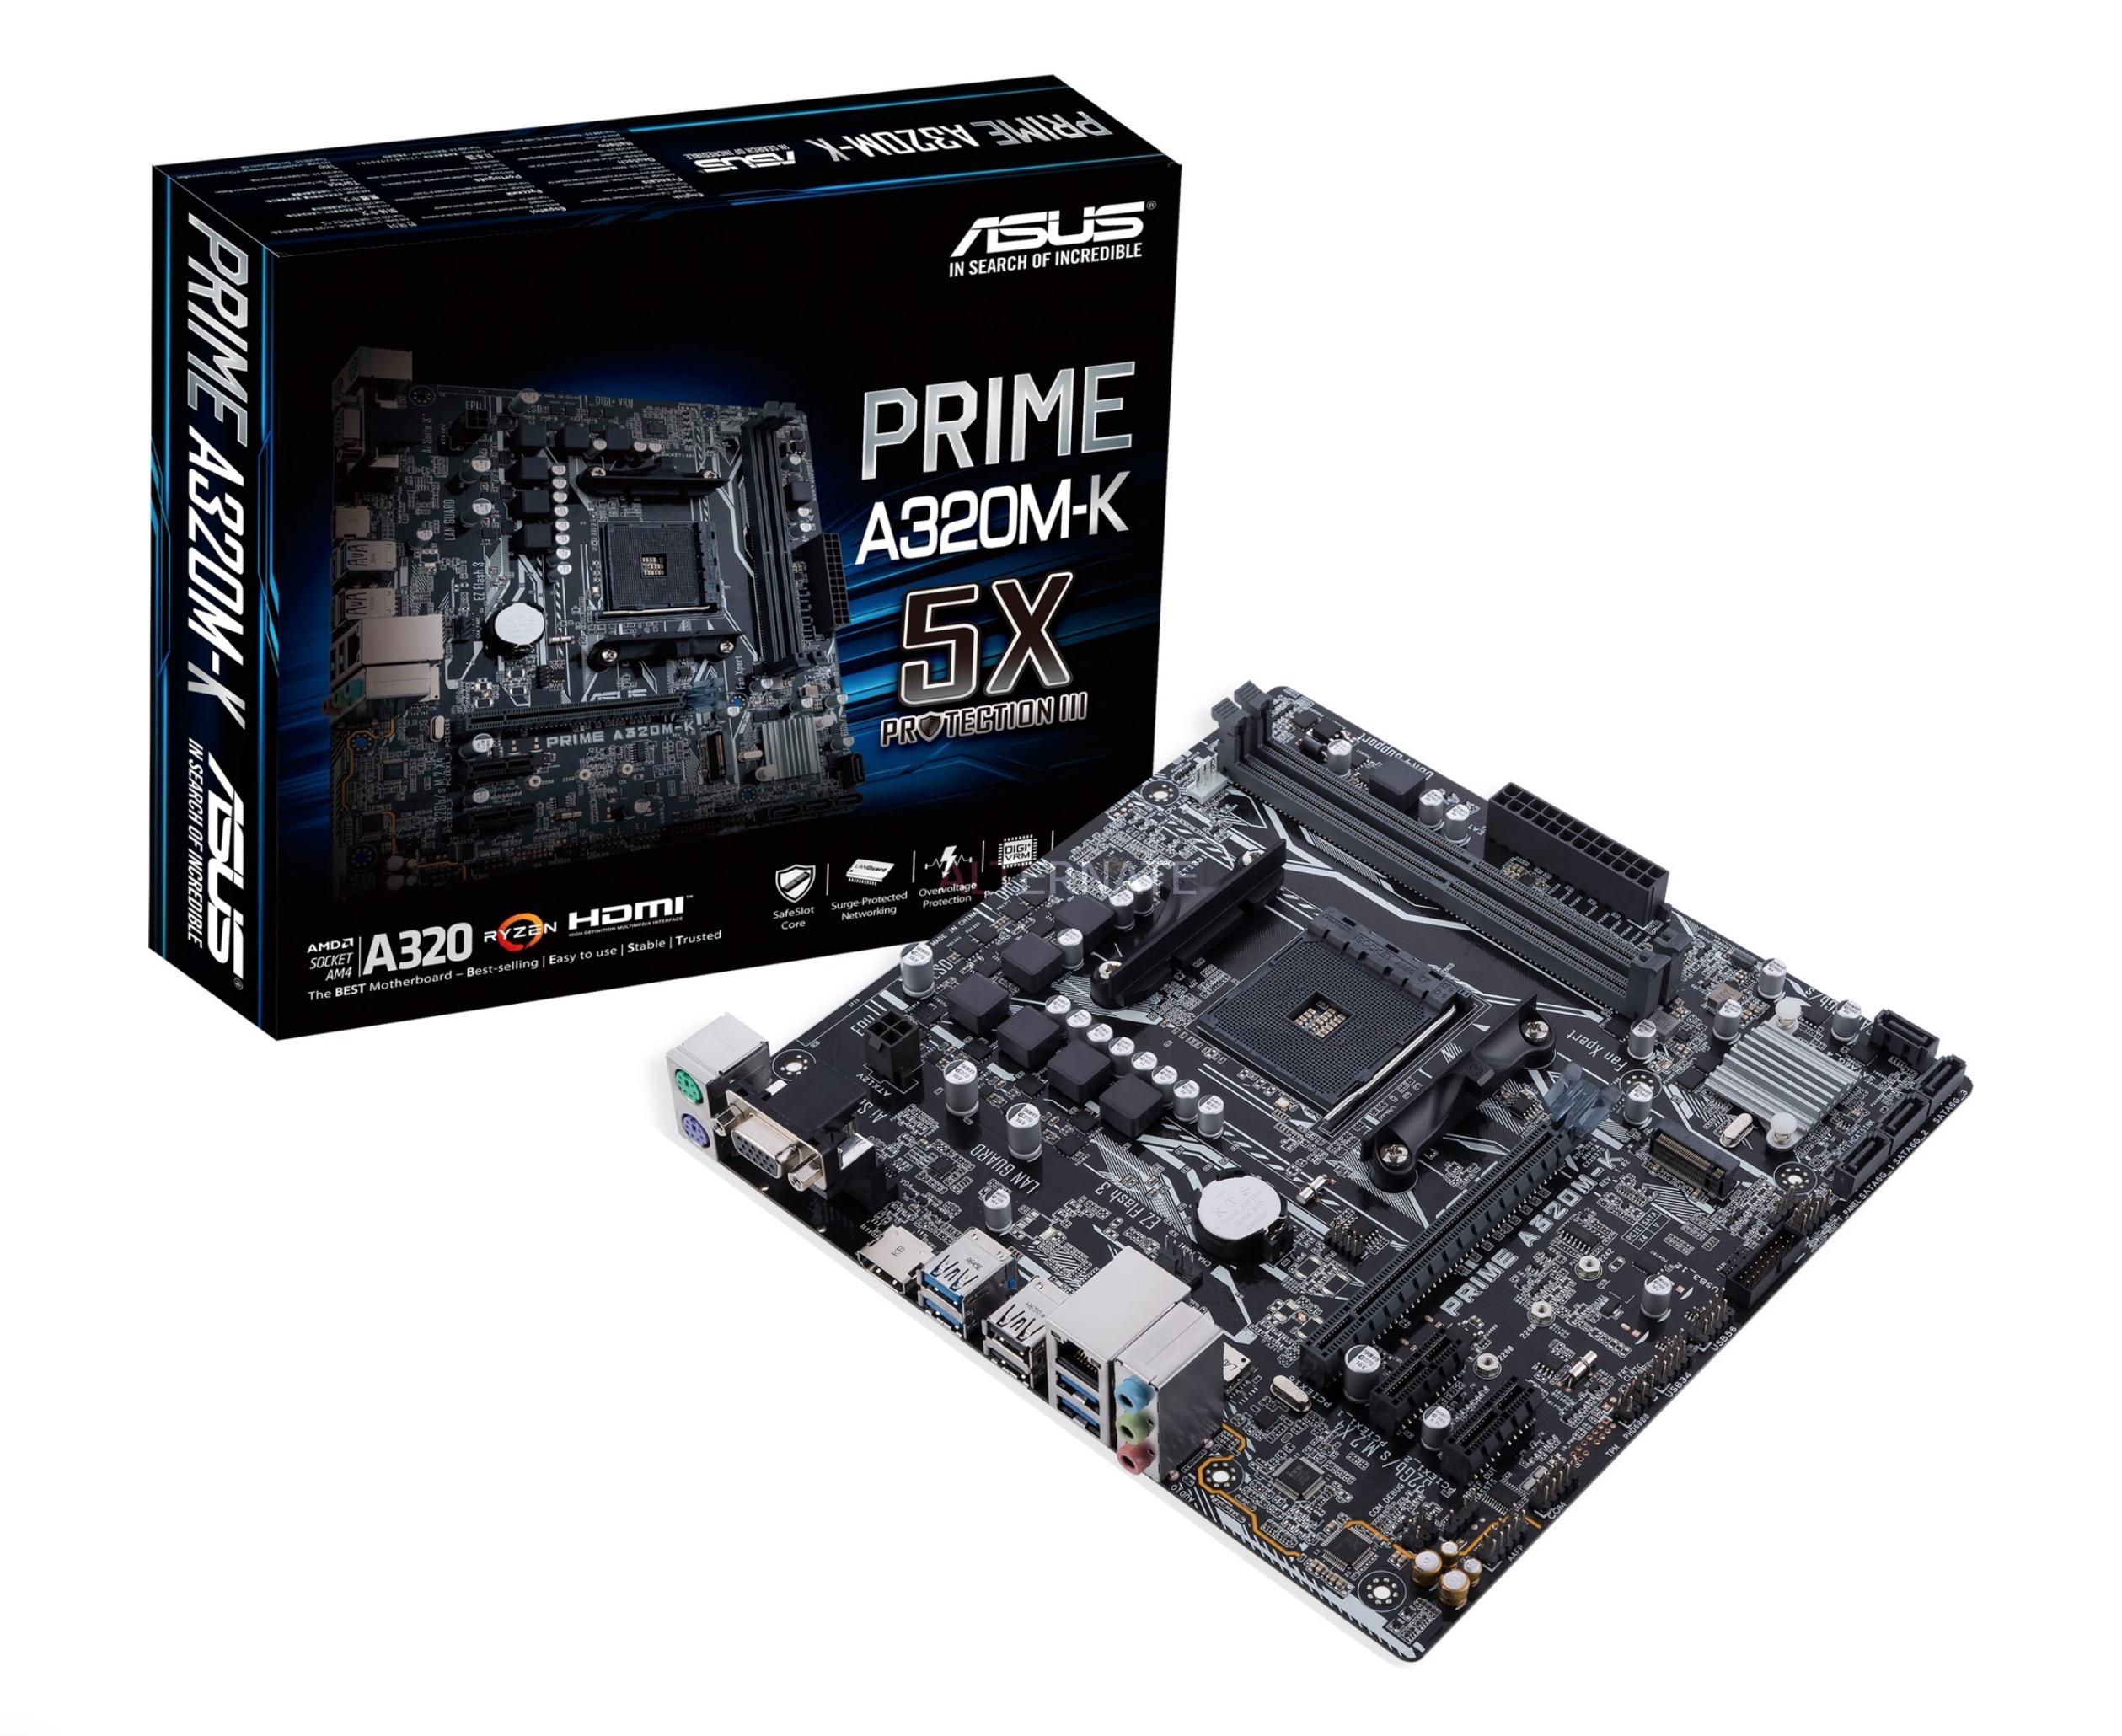 Mainboard ASUS PRIME A320M-K/CSM (AMD,AM4,DDR4,uATX)